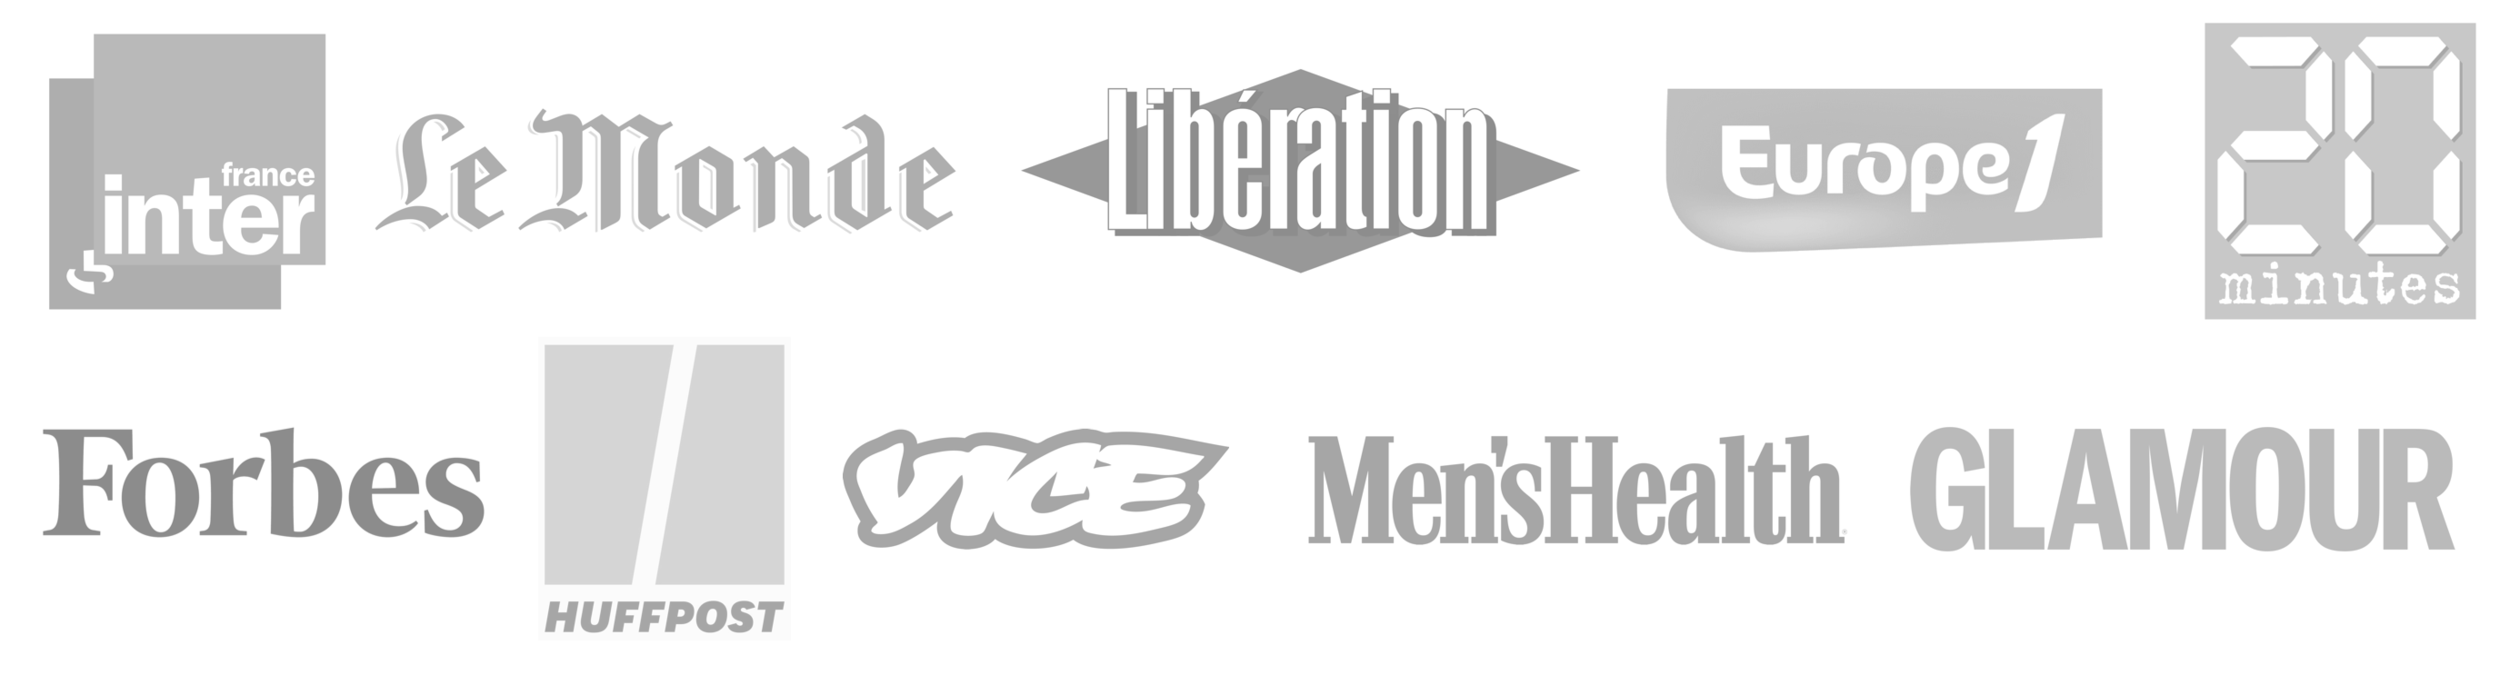 GCC press logos 26.04.2019.png